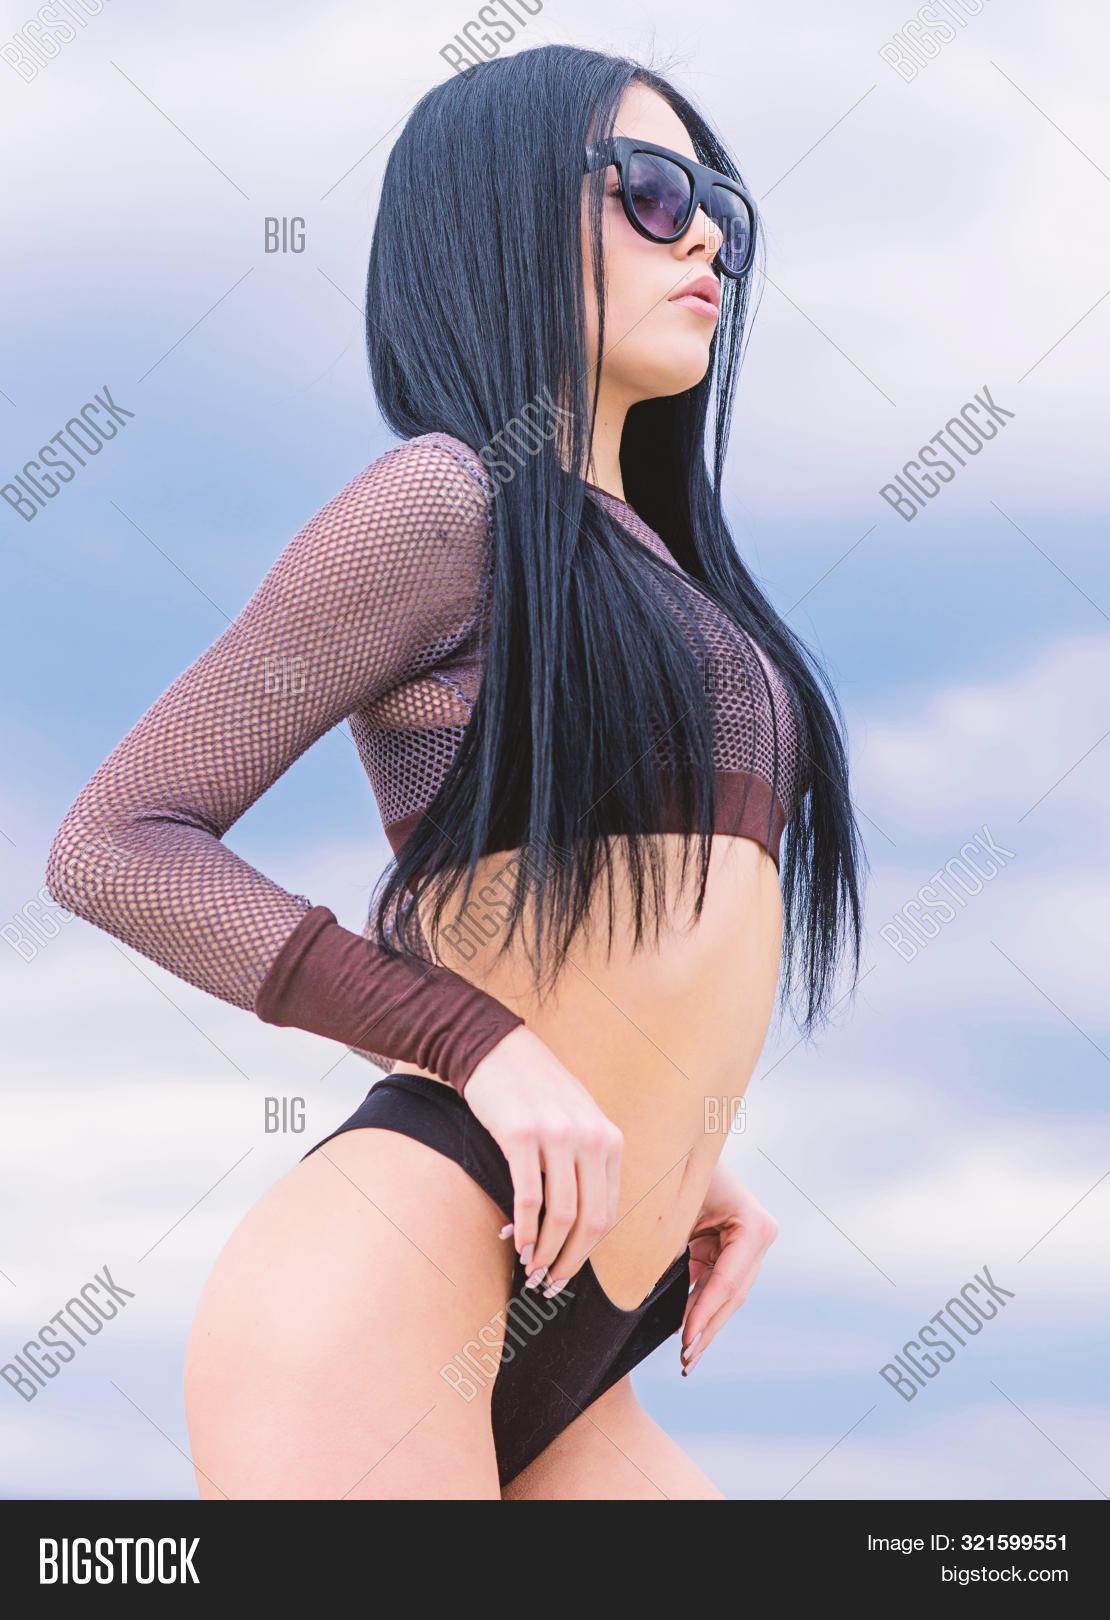 Girl Attractive Sexy Body Posing Sky Background. Woman Wear Sunglasses And Bikini. Slim Waist And Lo